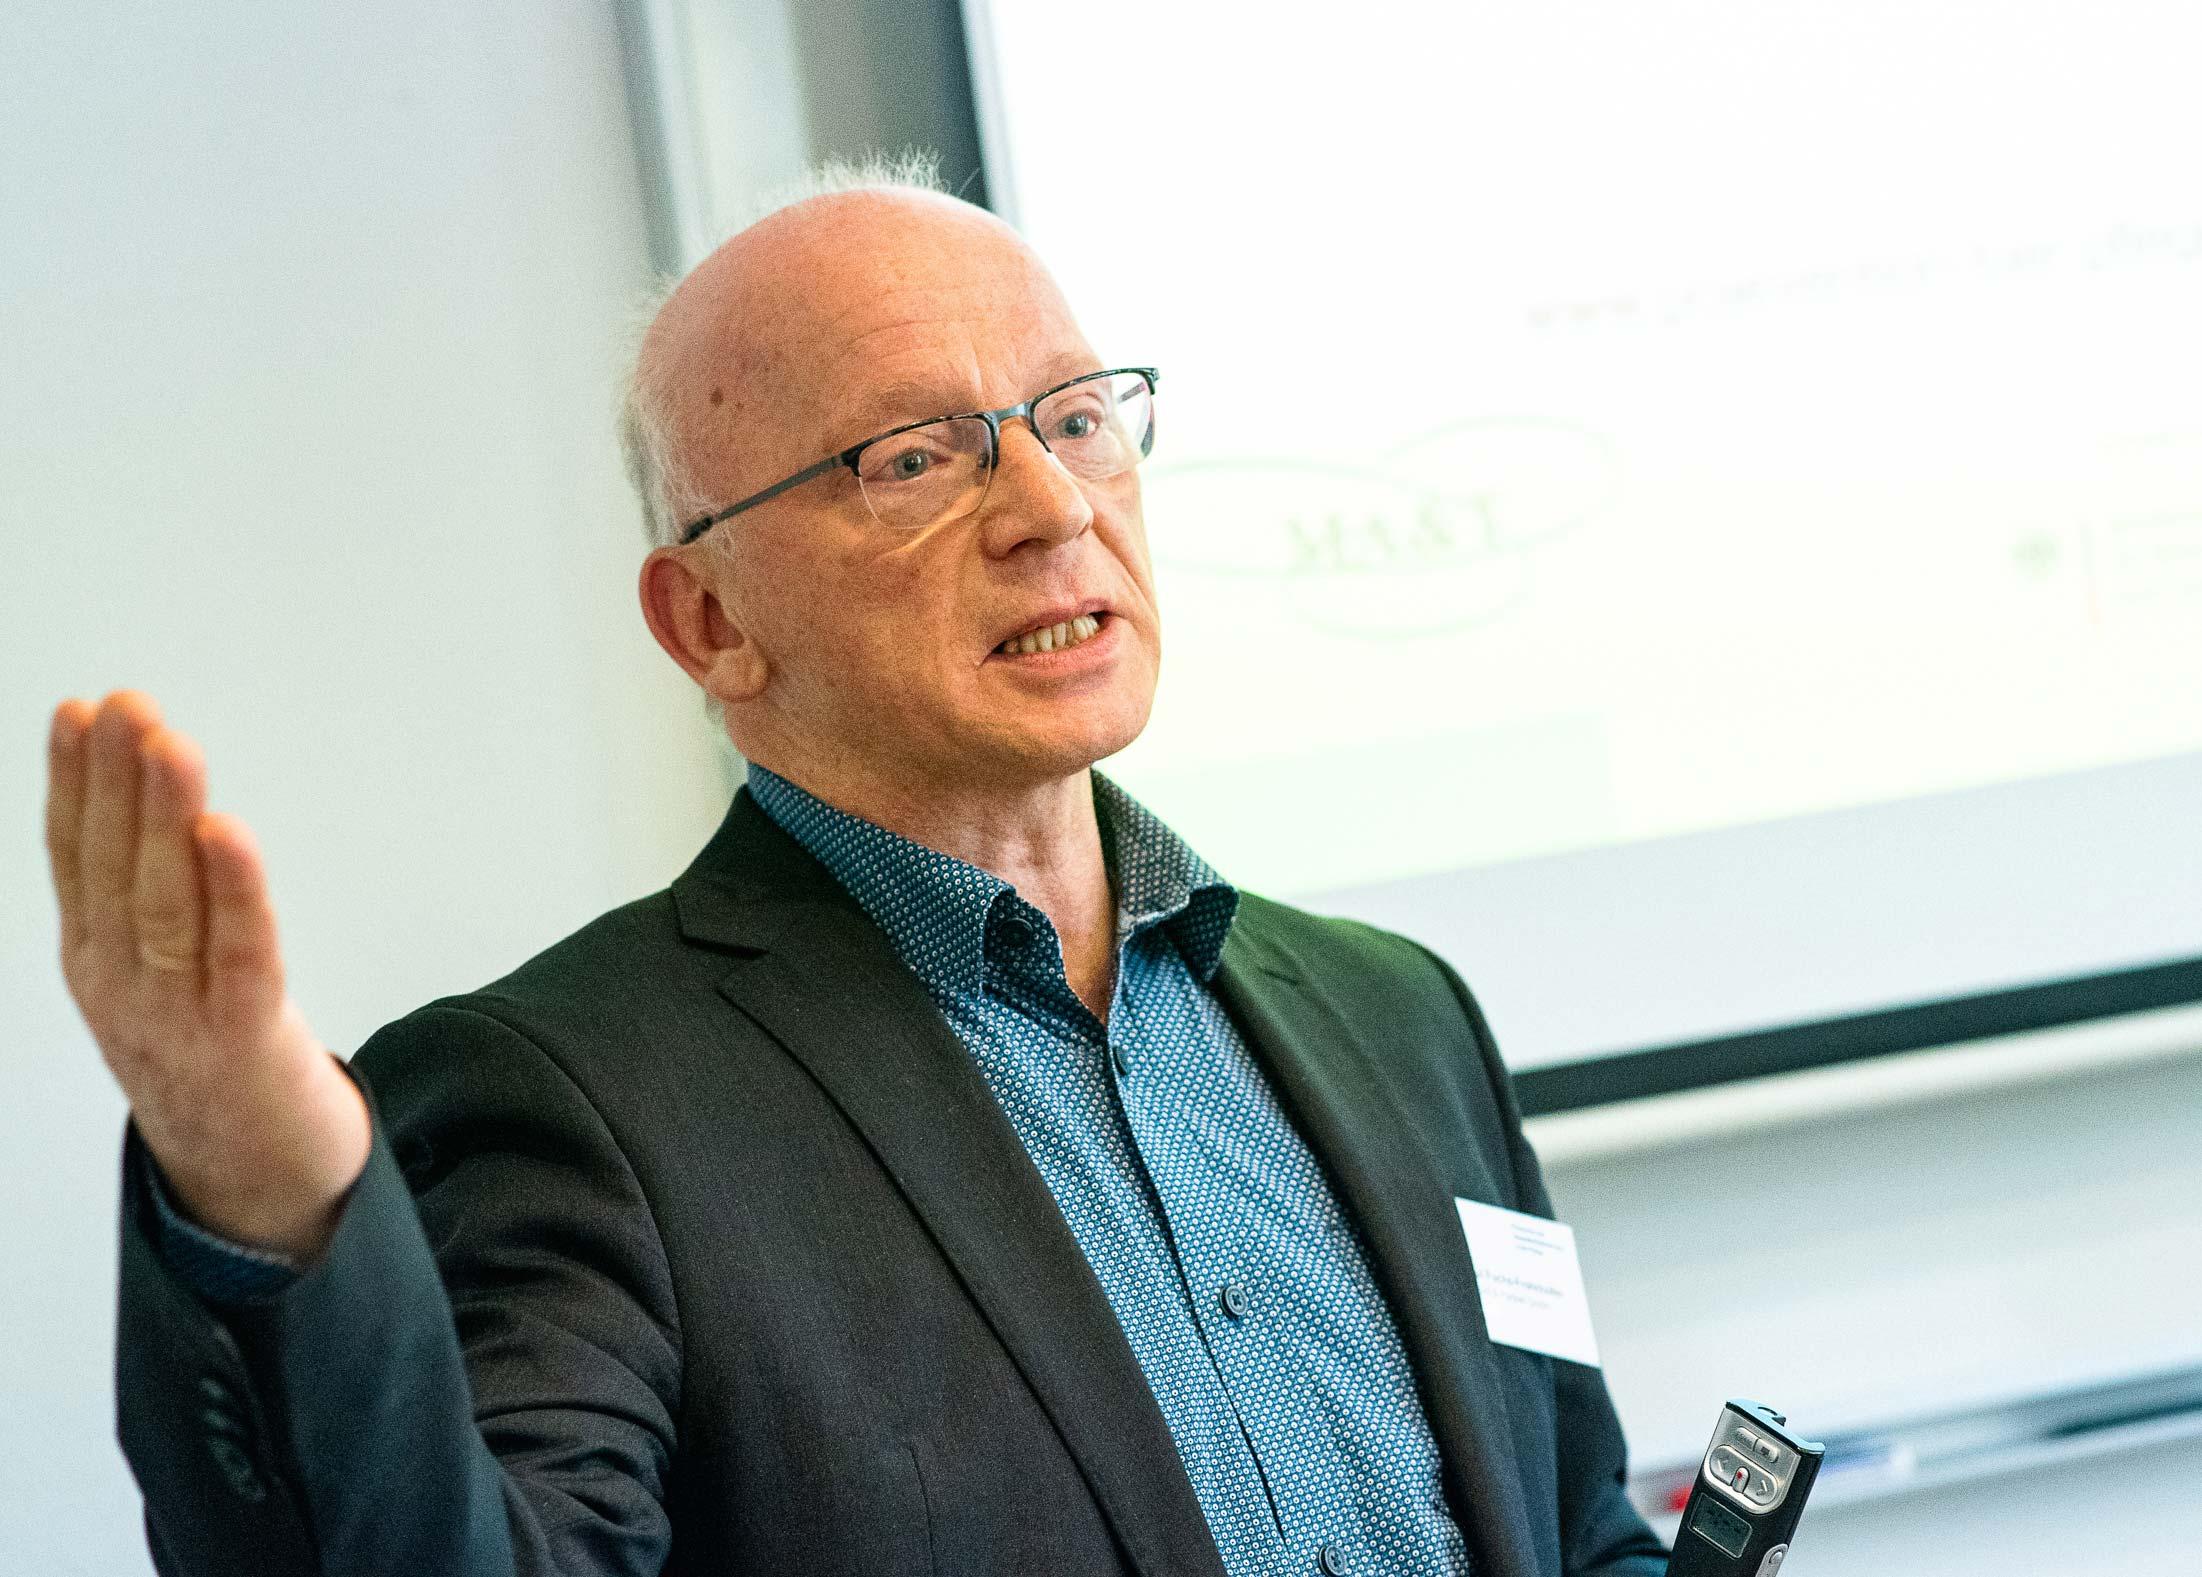 Dr. Paul Fuchs-Frohnhofen